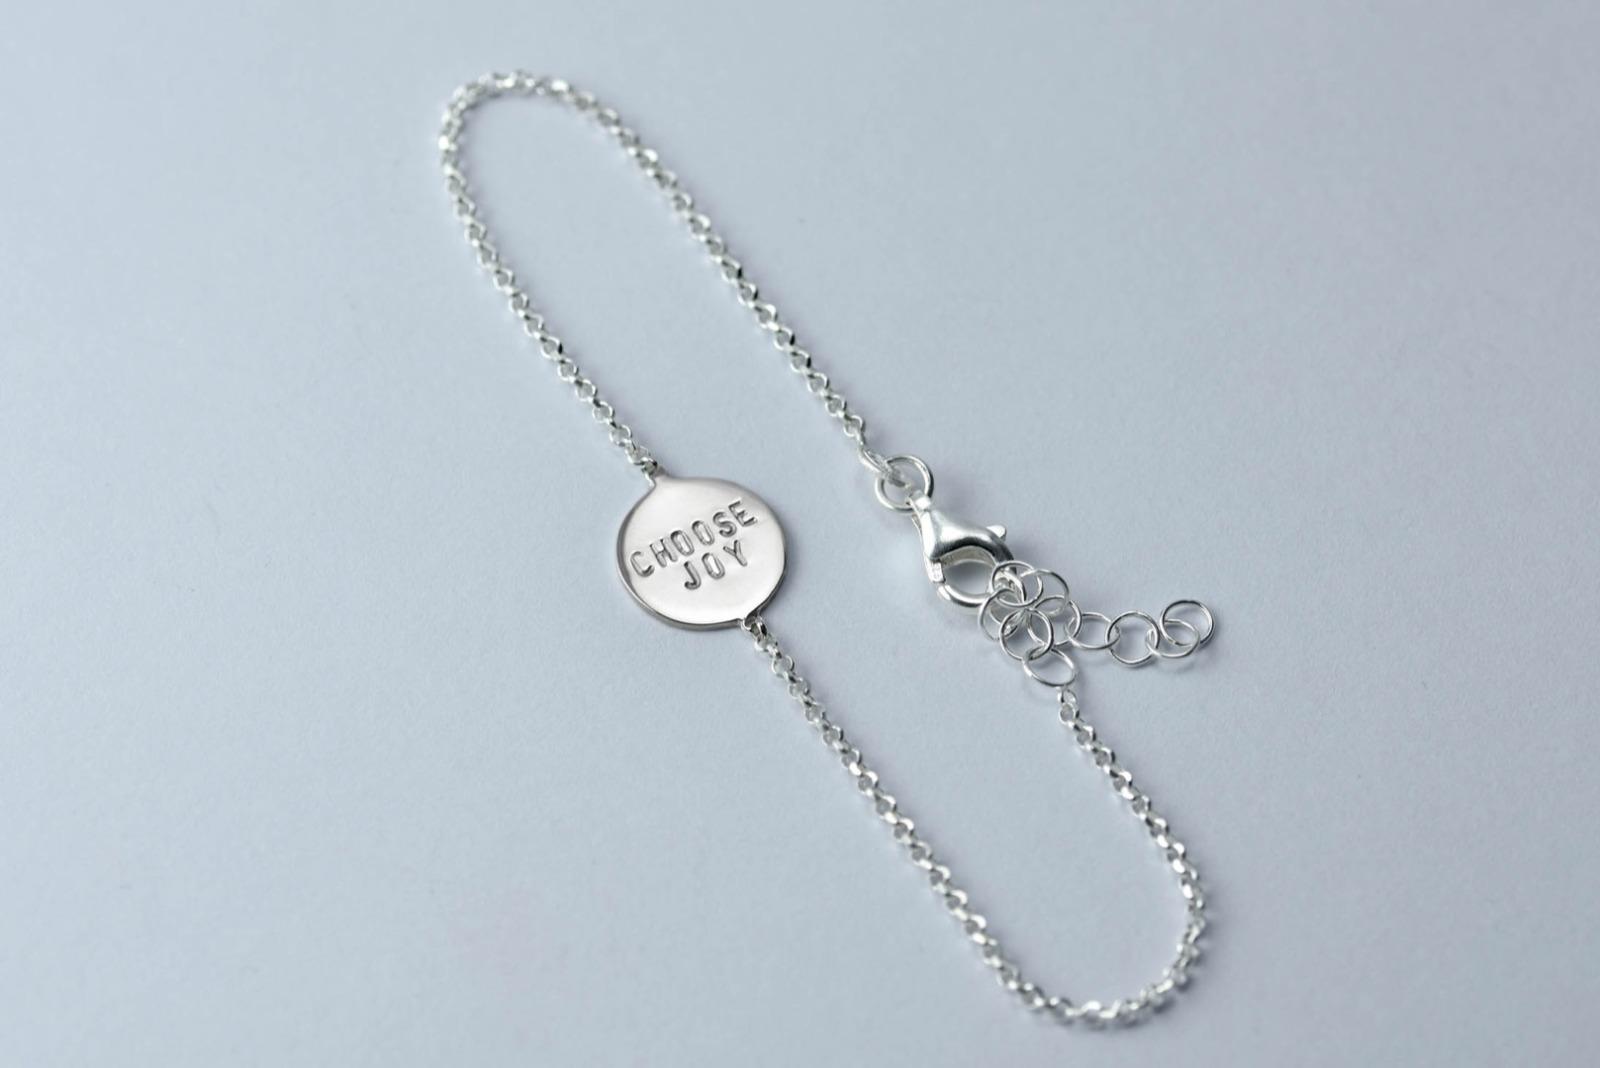 Zartes Silberarmband 2 - Namens-, Geburts-, Sprucharmband - 1